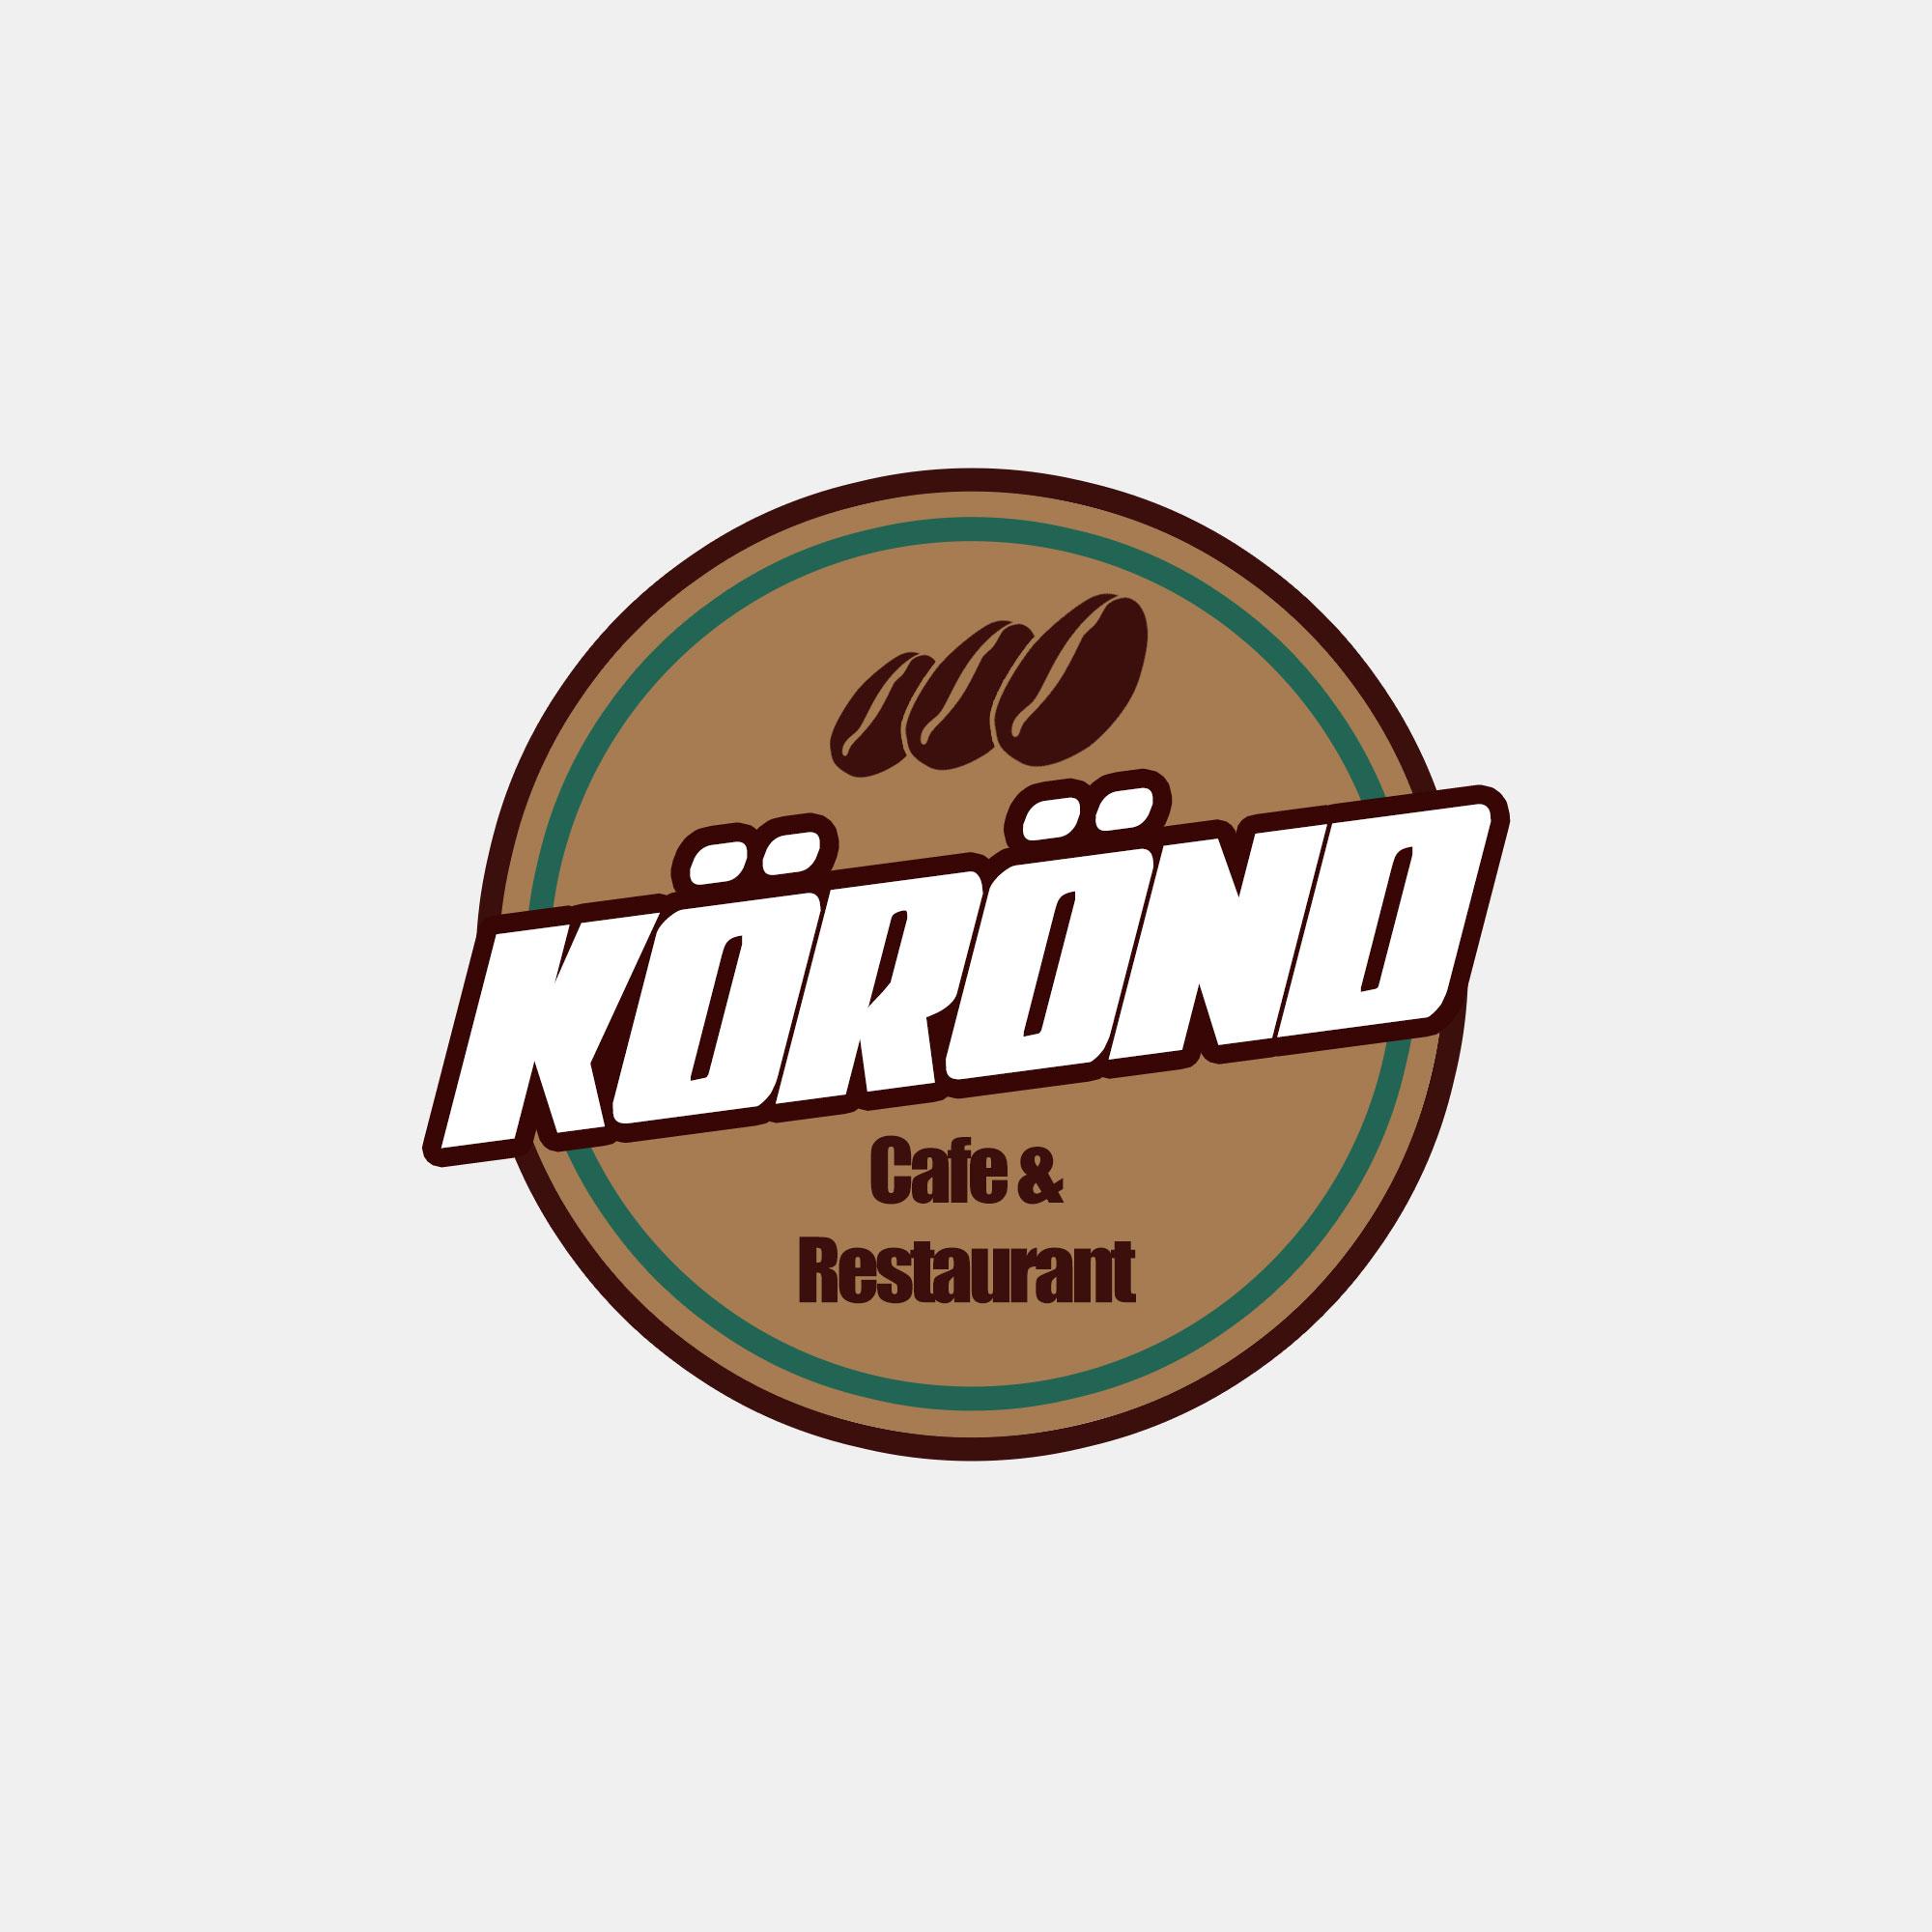 korond_cafe3_sw